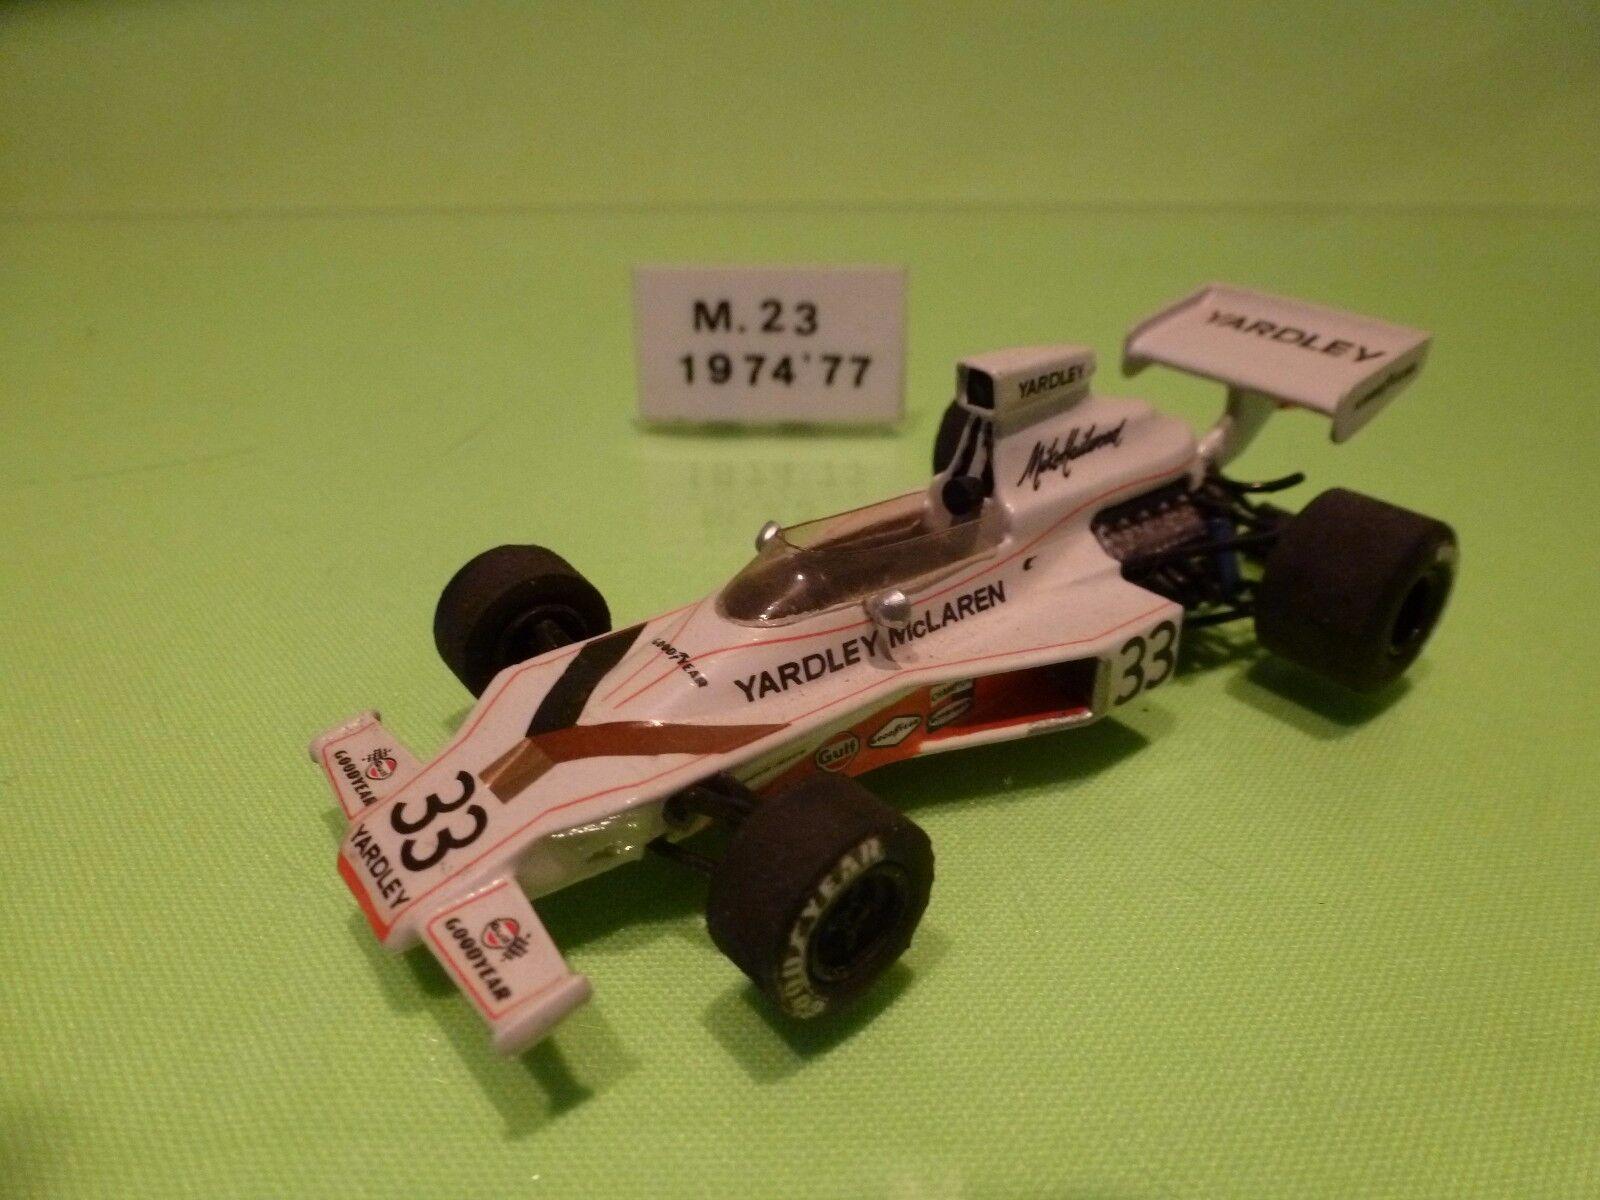 TENARIV KIT (built) McLAREN M23 1974 - MIKE HAILWOOD - F1 1 43 - NICE CONDITION